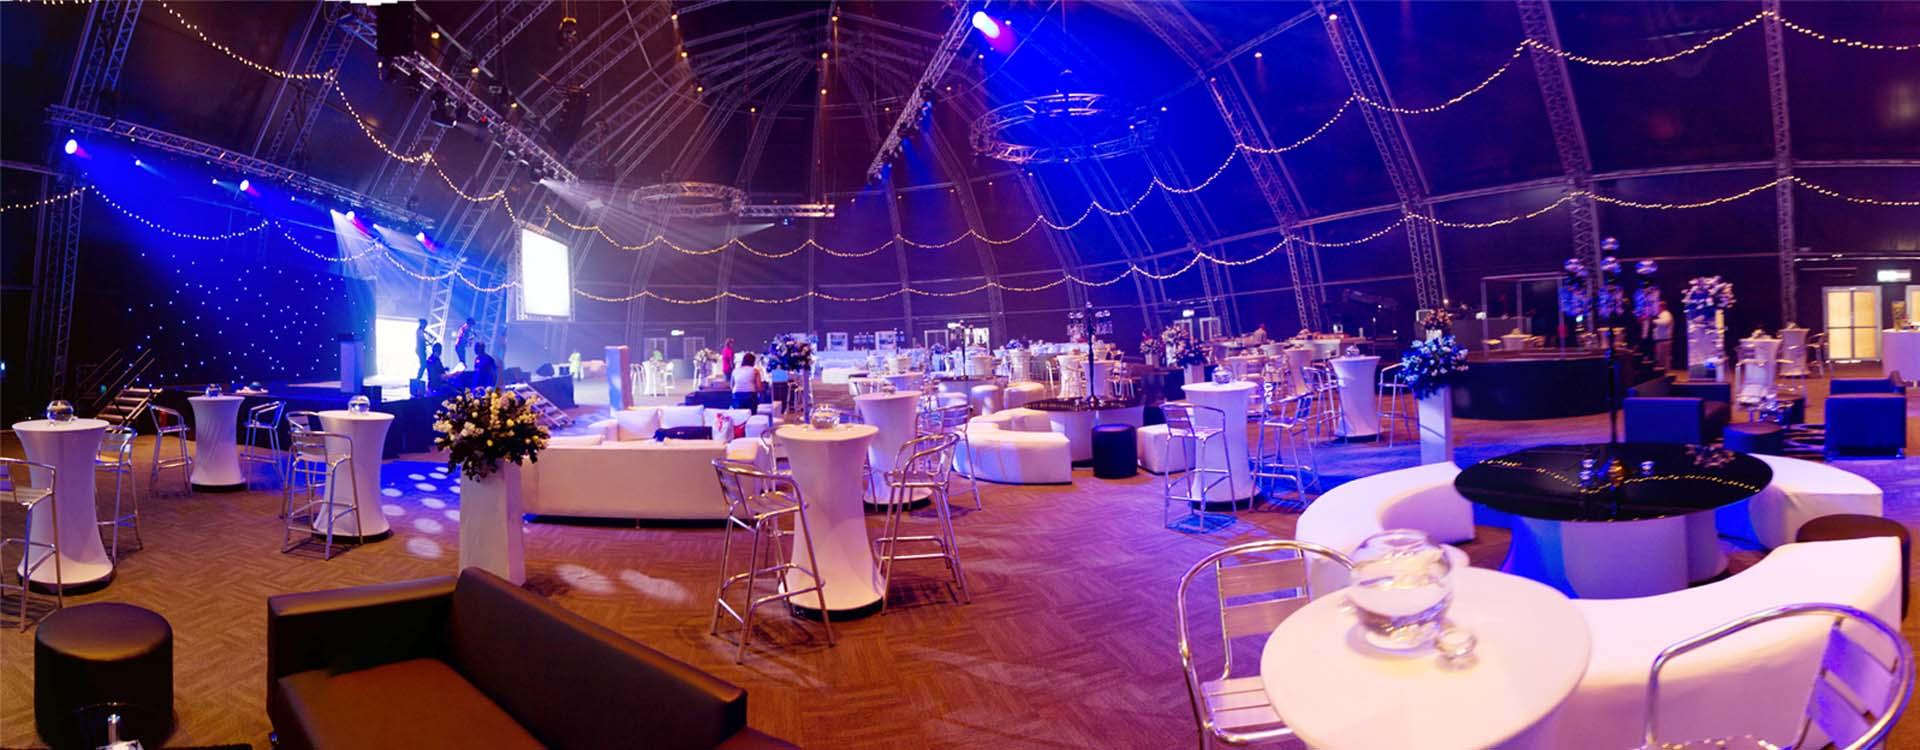 SA Wedding Corporate Events